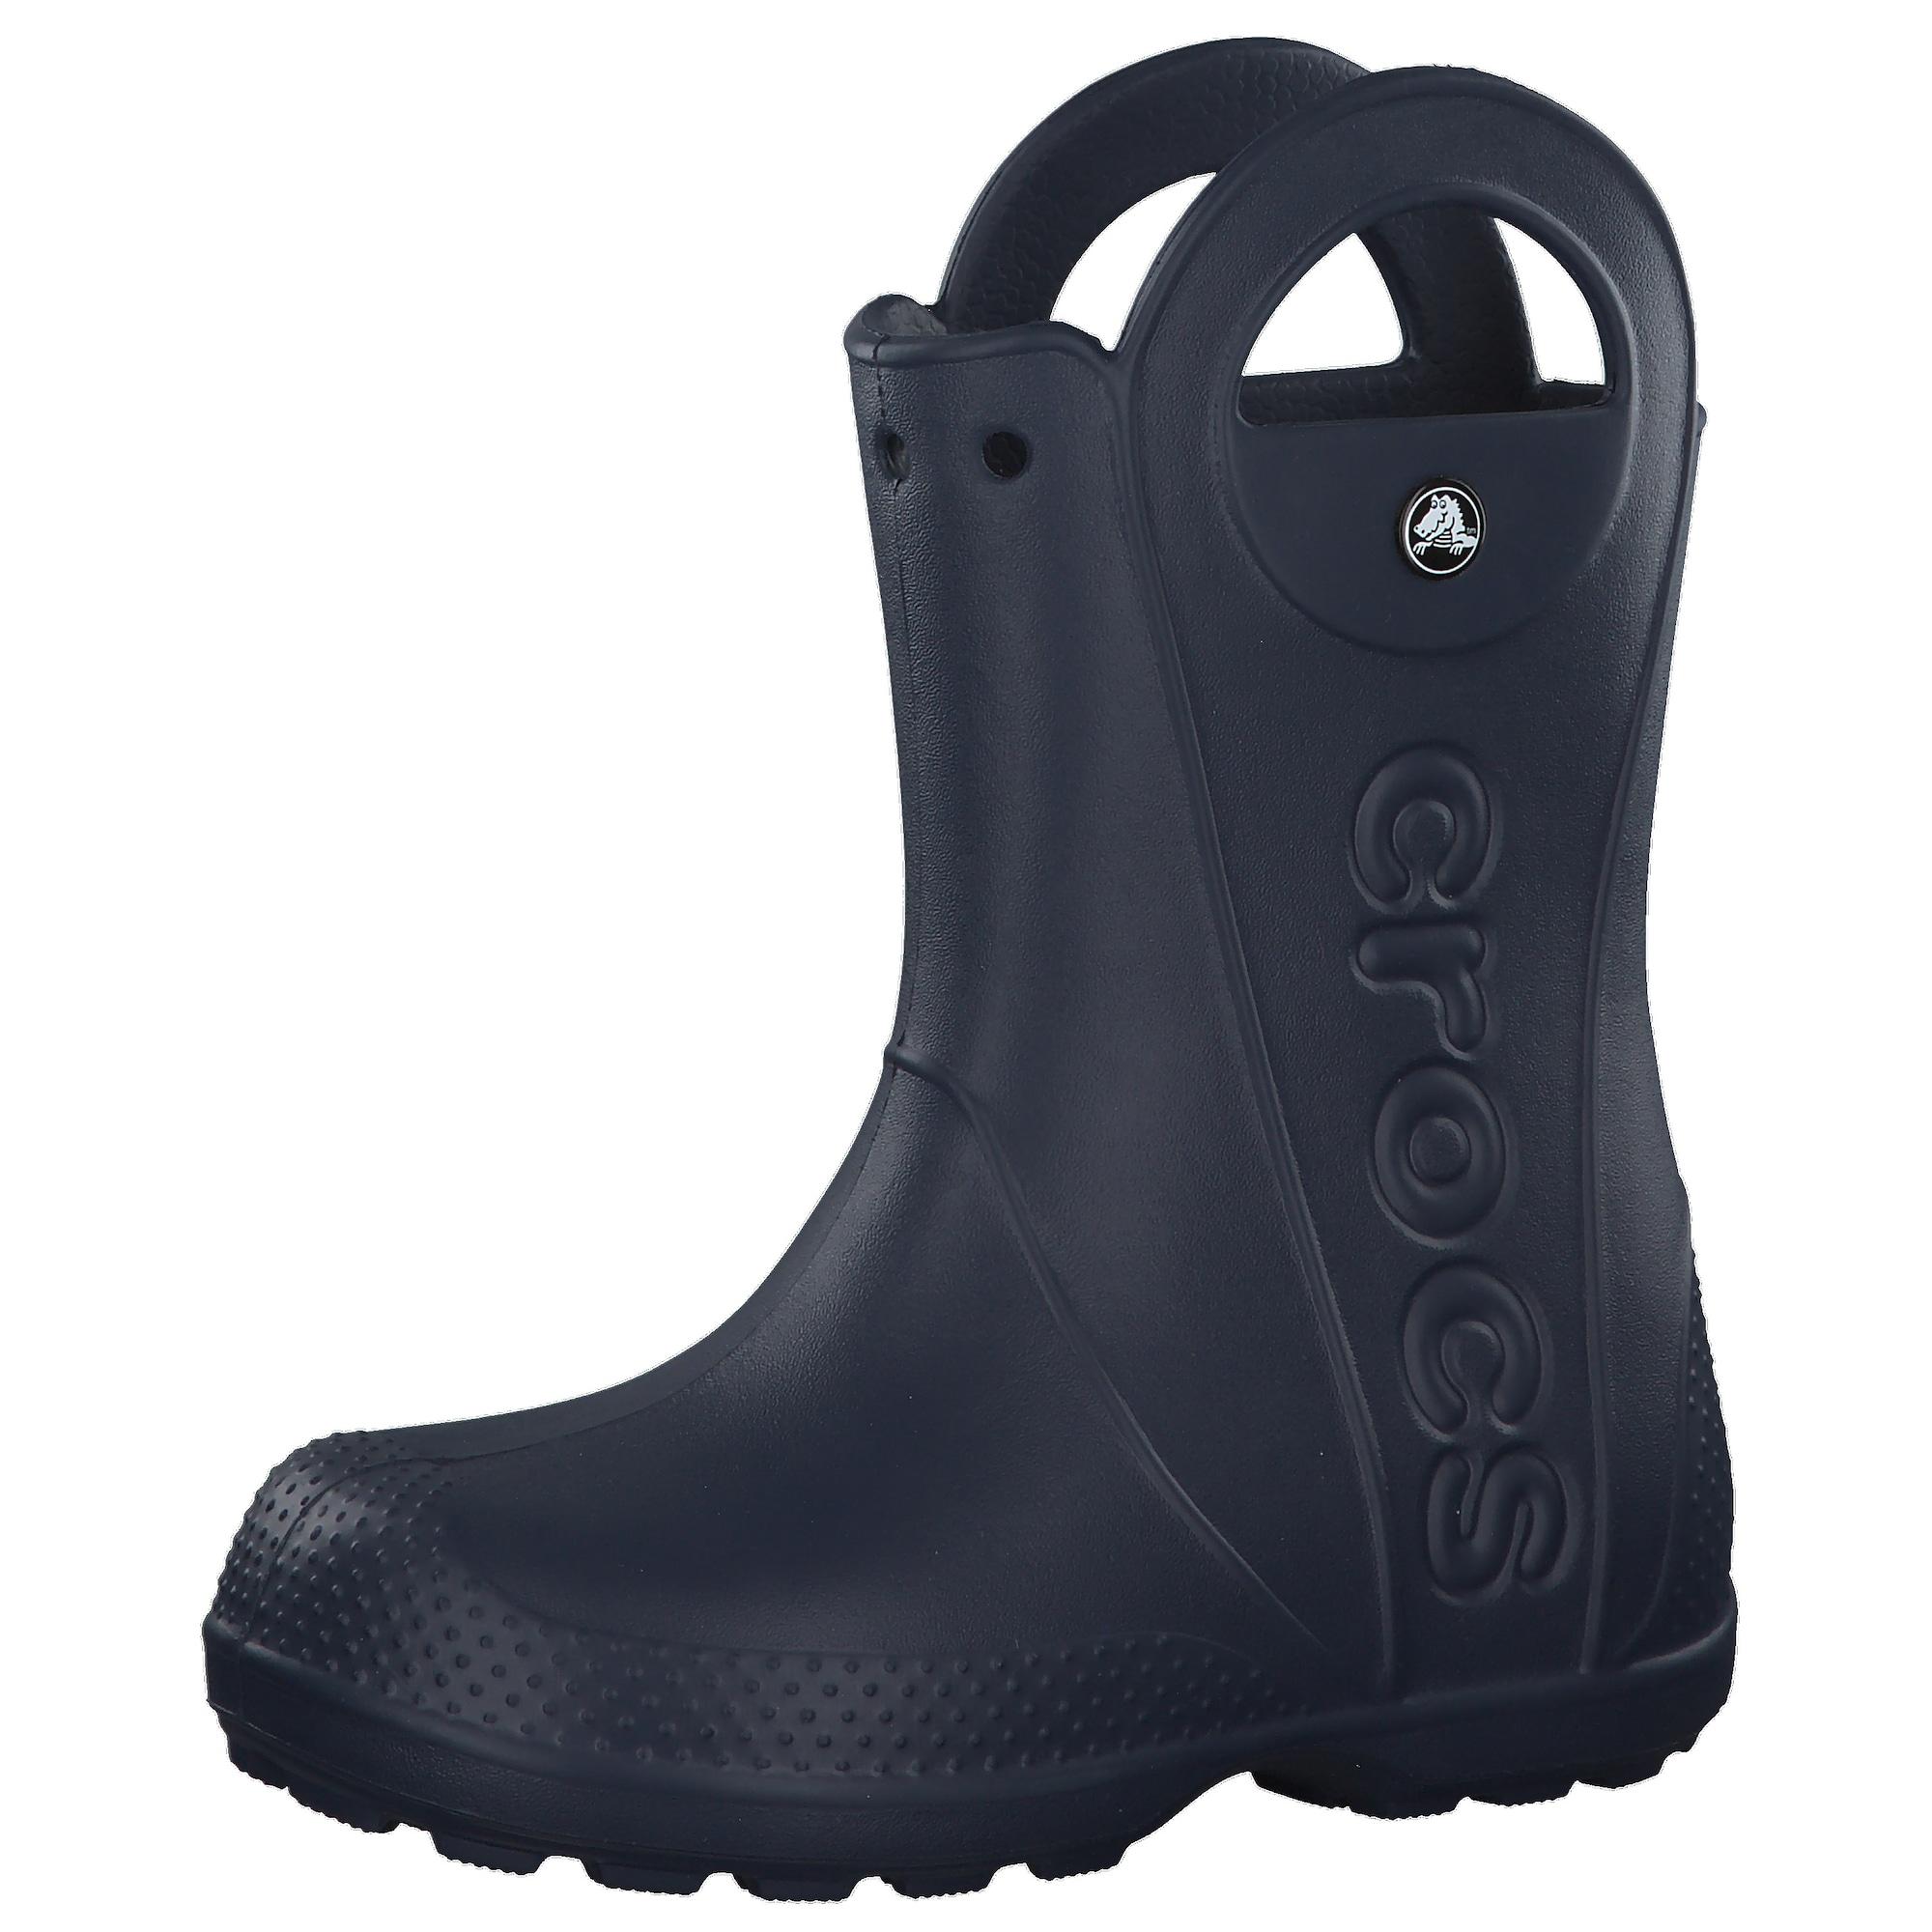 Crocs Guminiai batai 'Handle It' tamsiai mėlyna